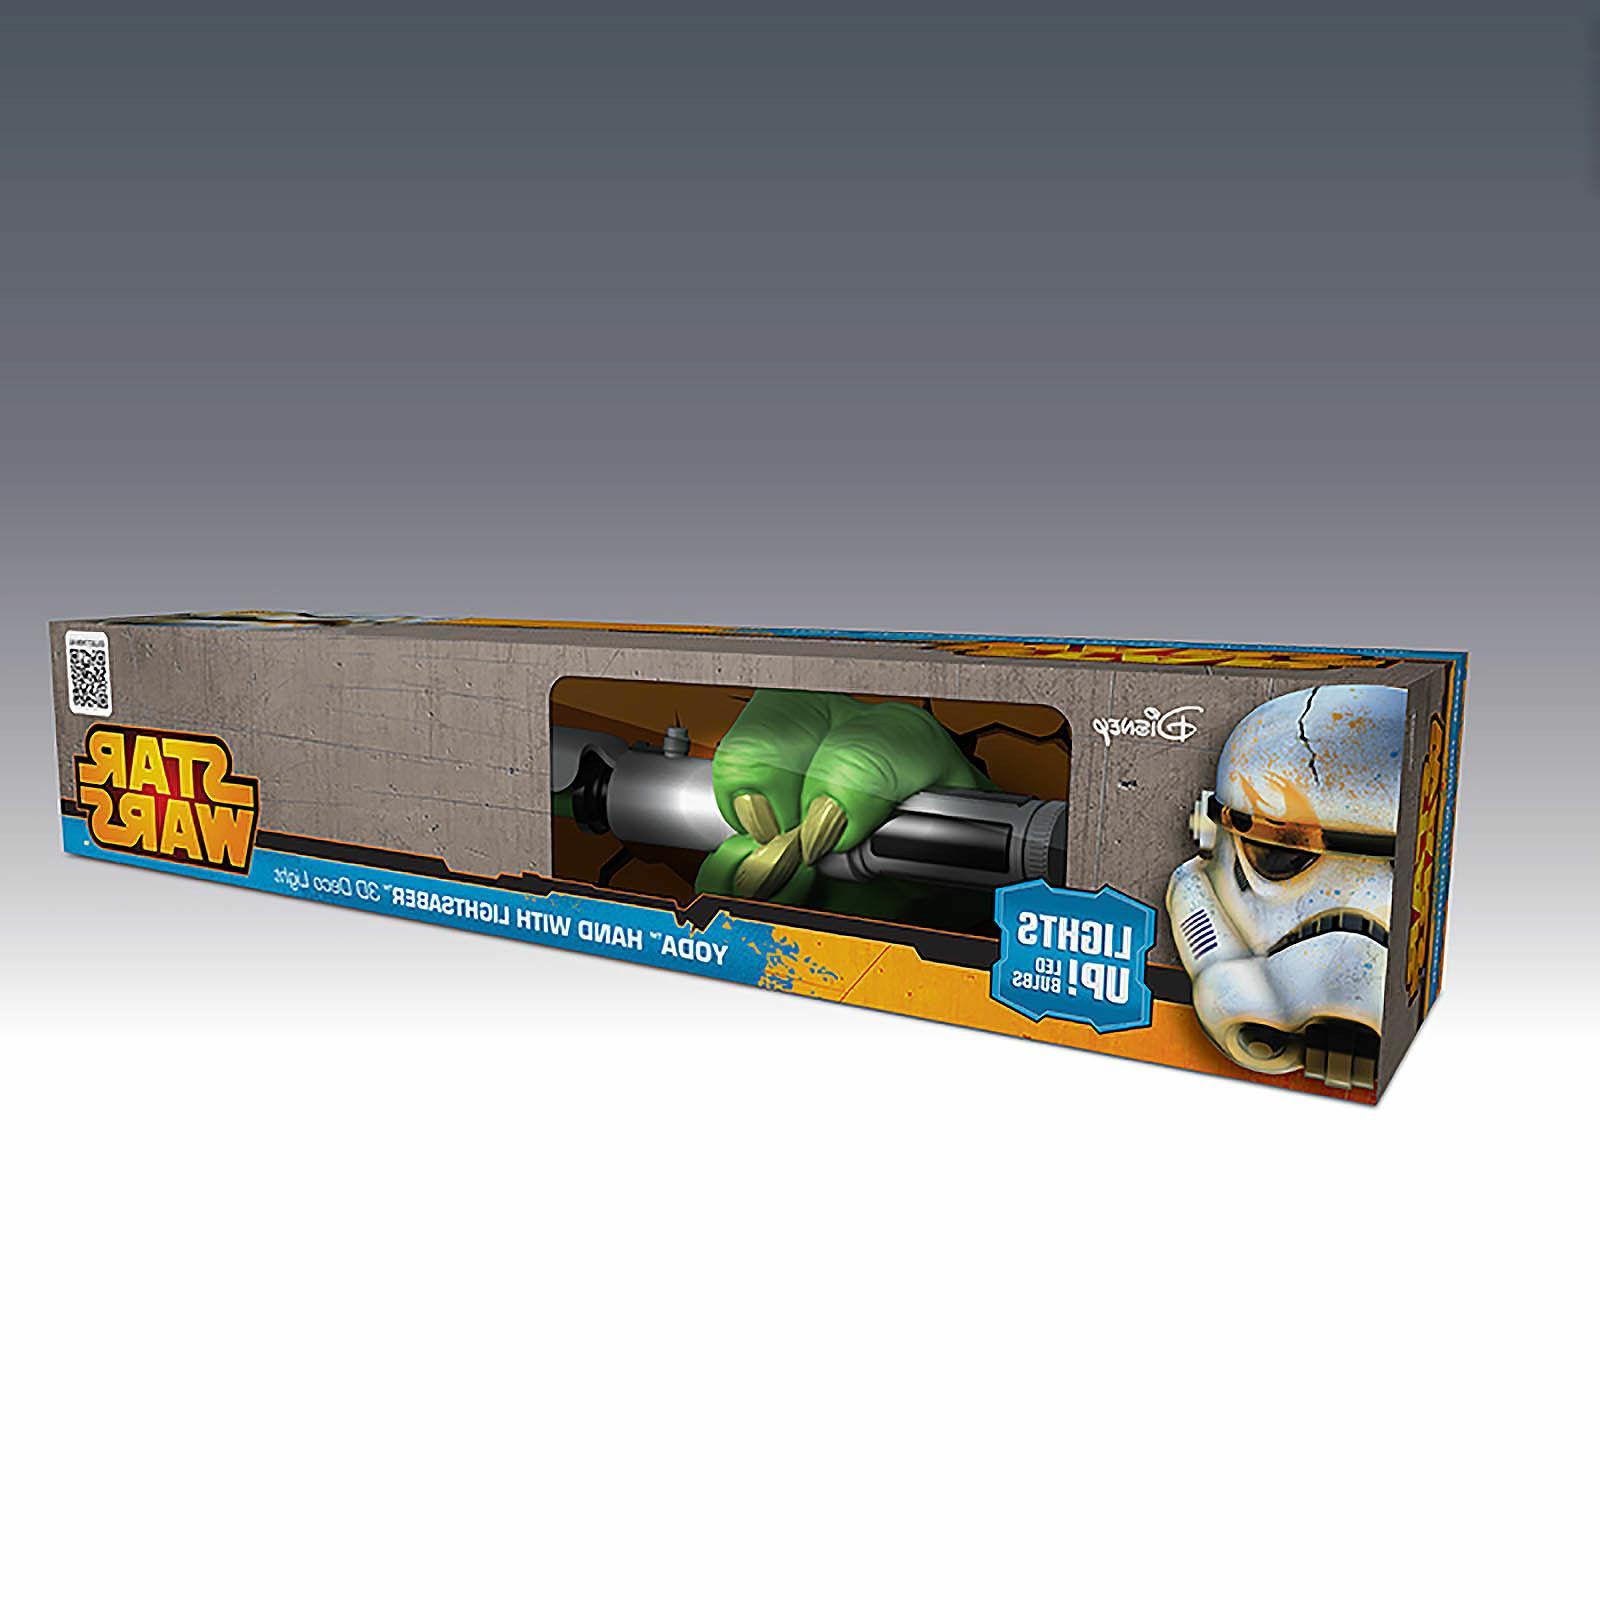 3D FX Deco LED Night Light Star Wars Yoda Hand with Lightsab